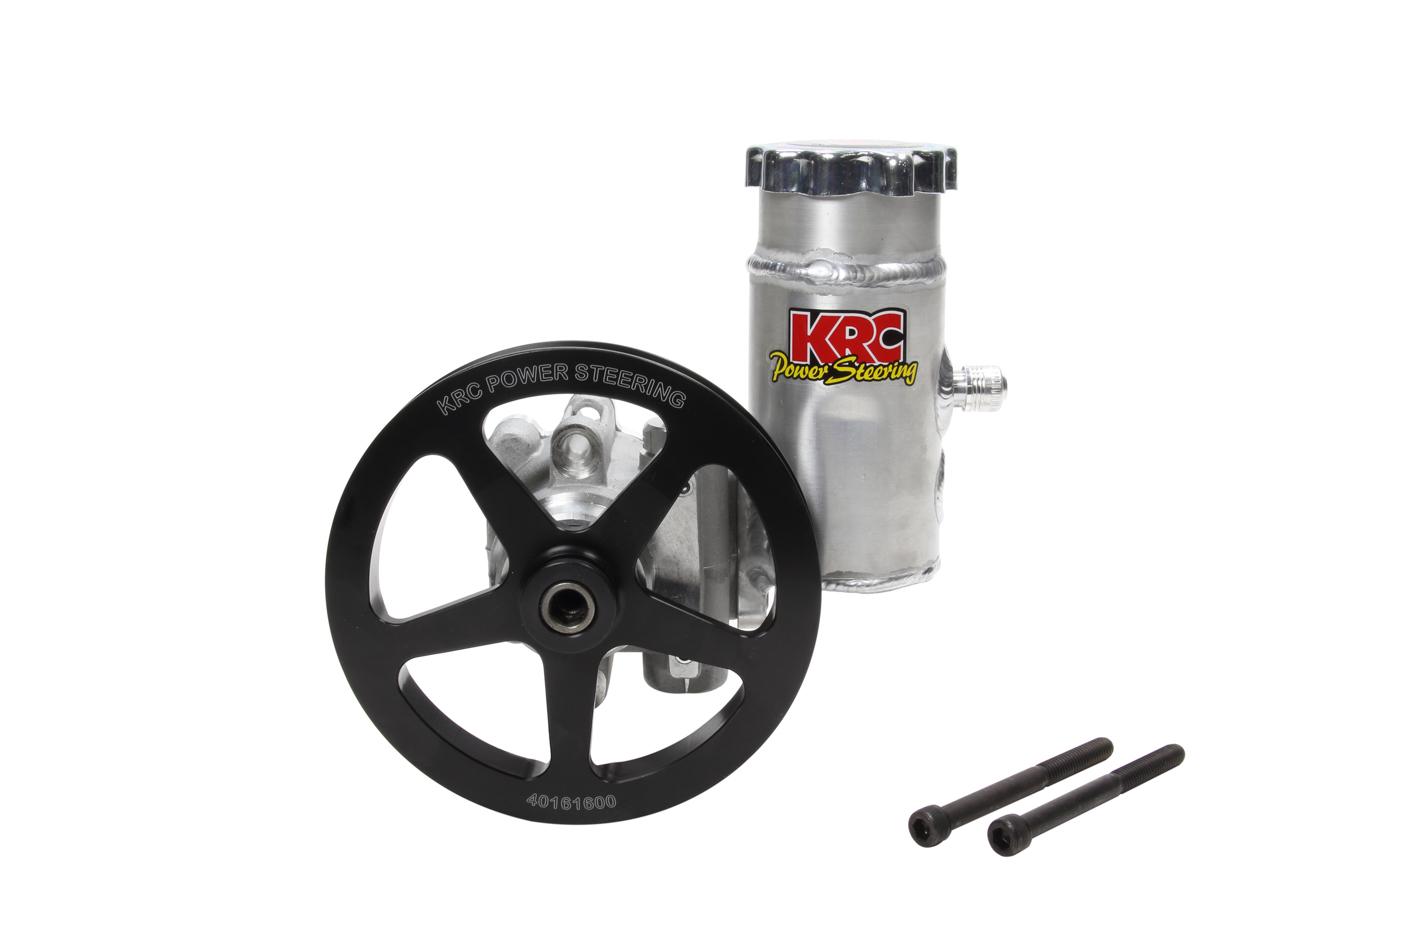 KRC Power Steering ESP19610100 Power Steering Pump, Elite, Adjustable psi, 6 in V-Belt Pulley / Bolt-On Tank Included, Aluminum, Natural, GM Type II, Universal, Each